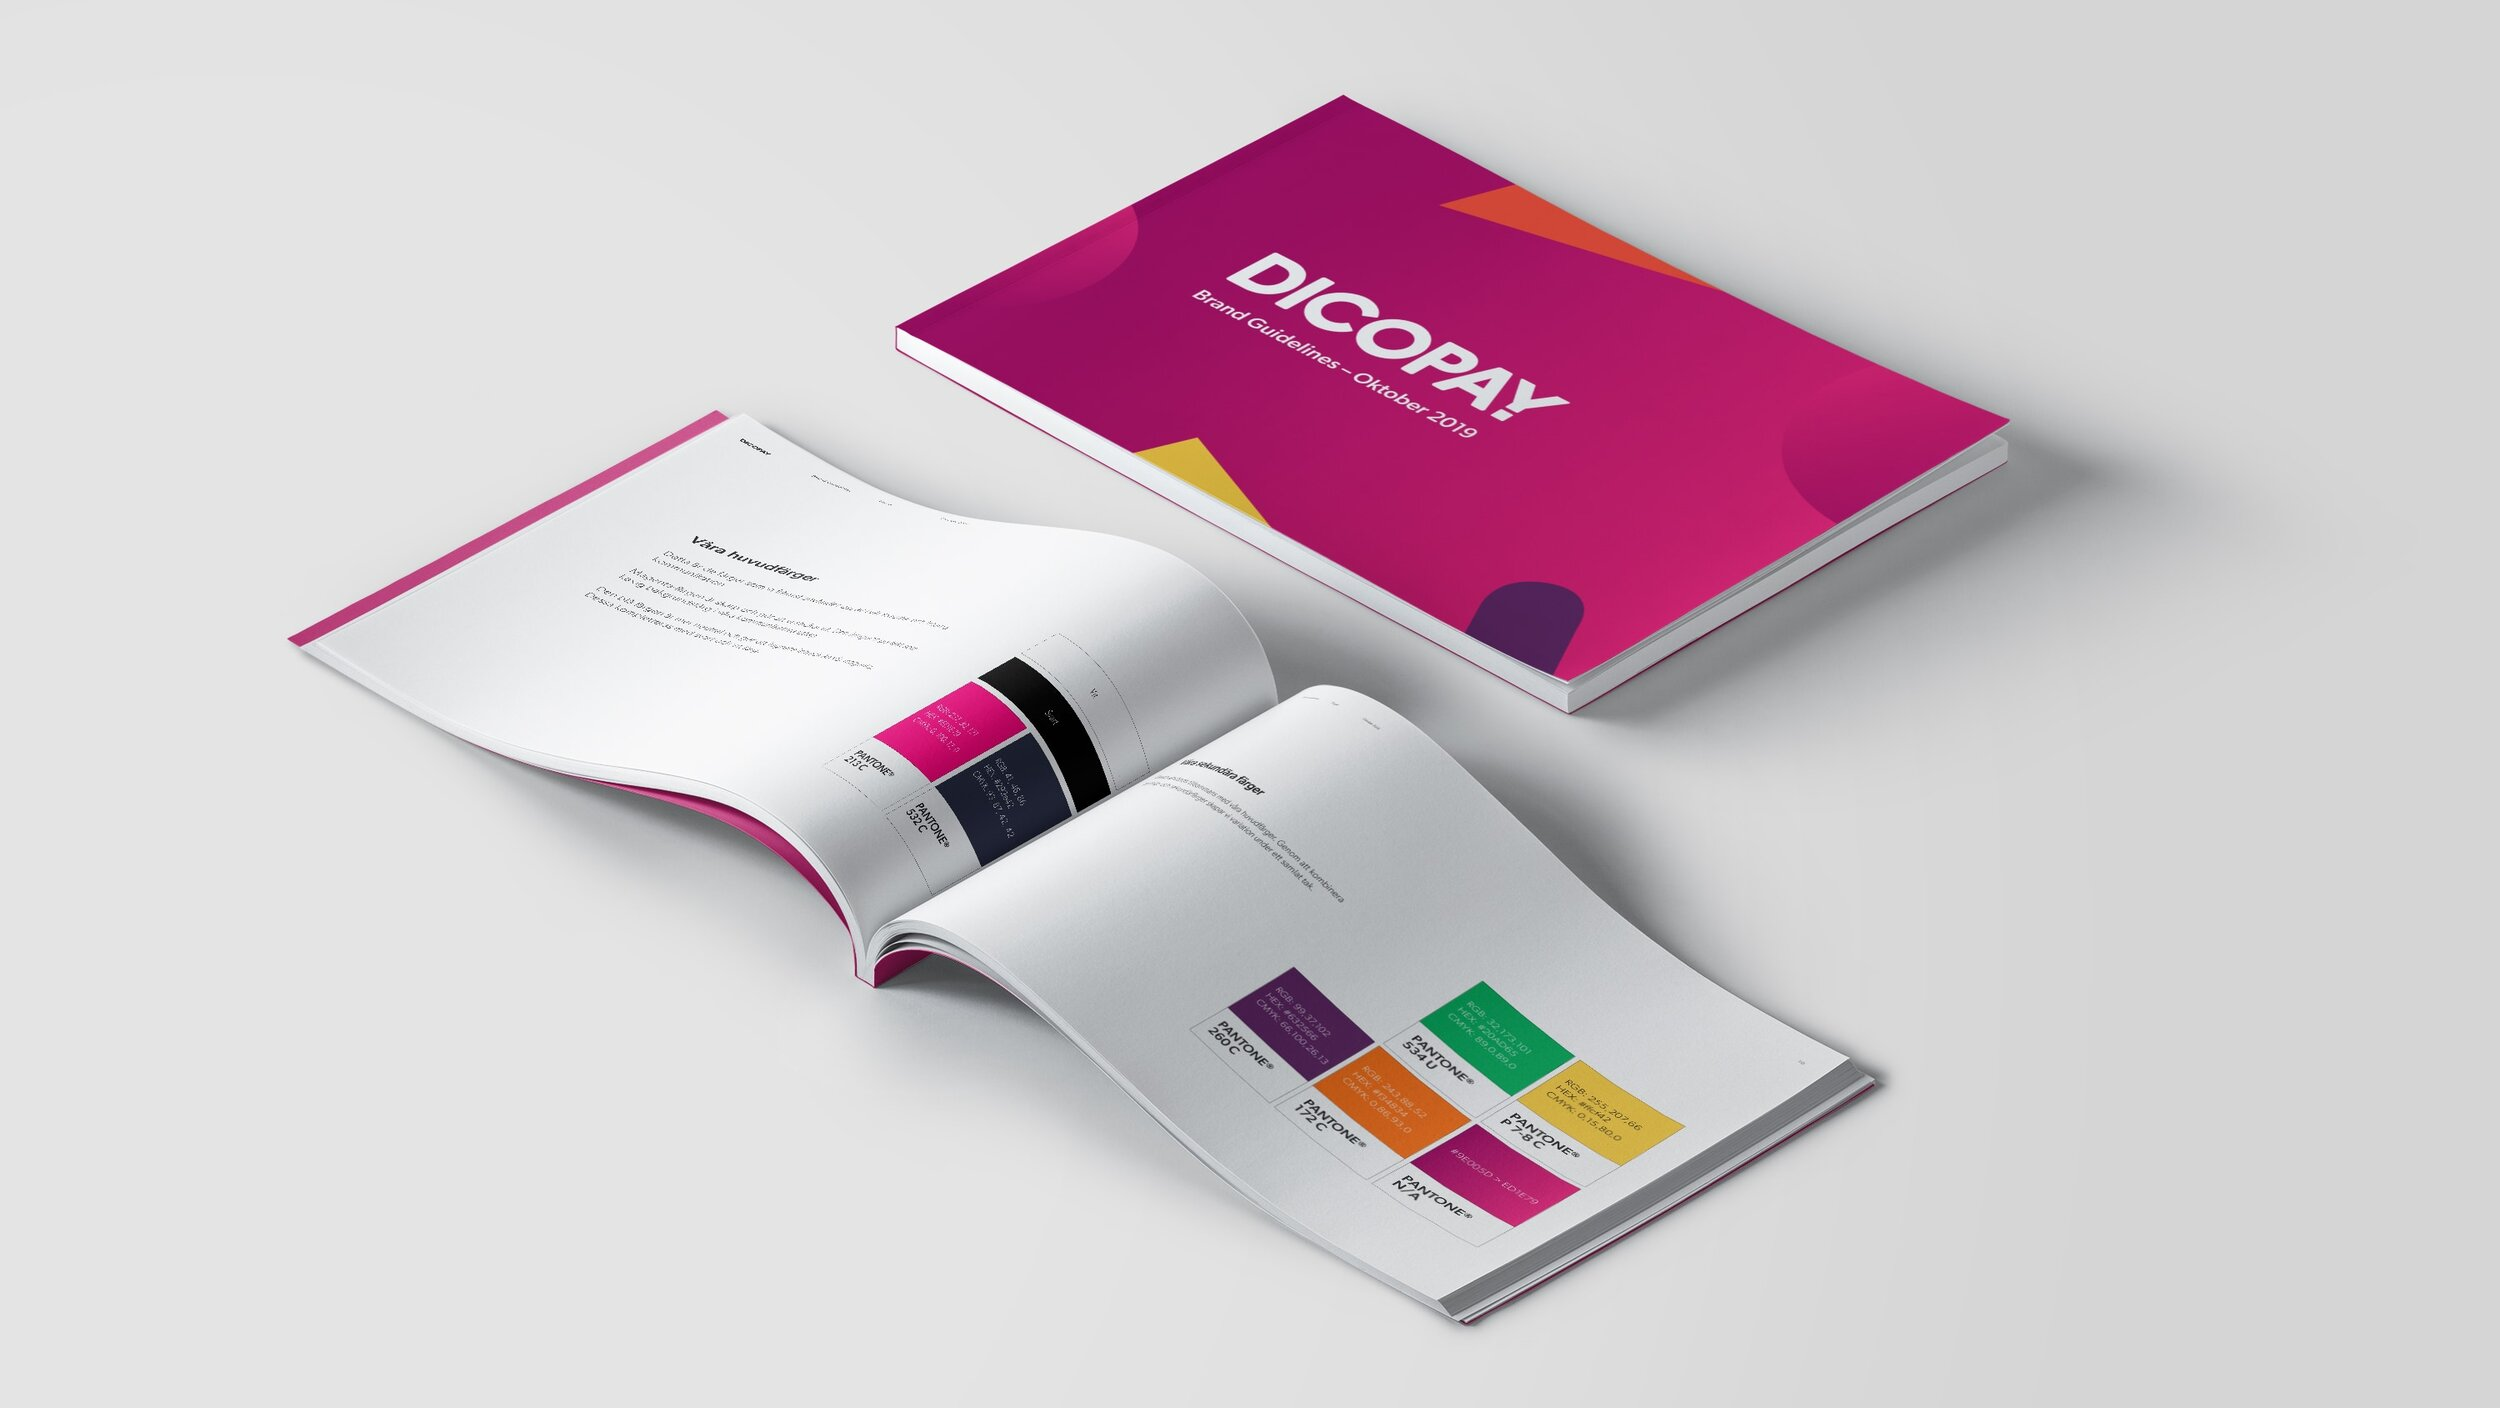 dicopay-brandbook-img.jpg